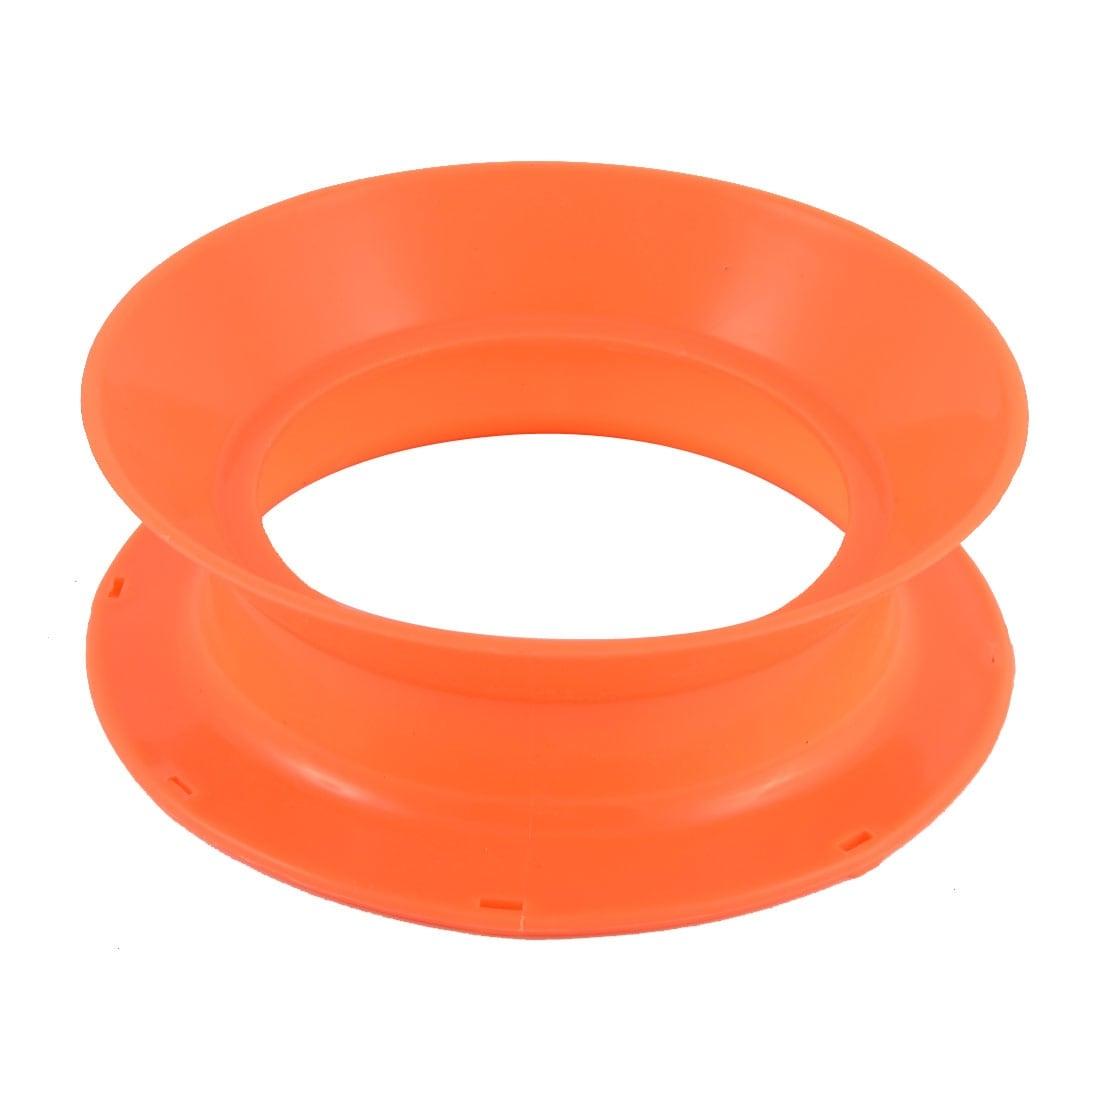 Unique Bargains Plastic Fish Line Wire Bearing Fishing Spinning Reel Wheel 8 Inch Dia Orange